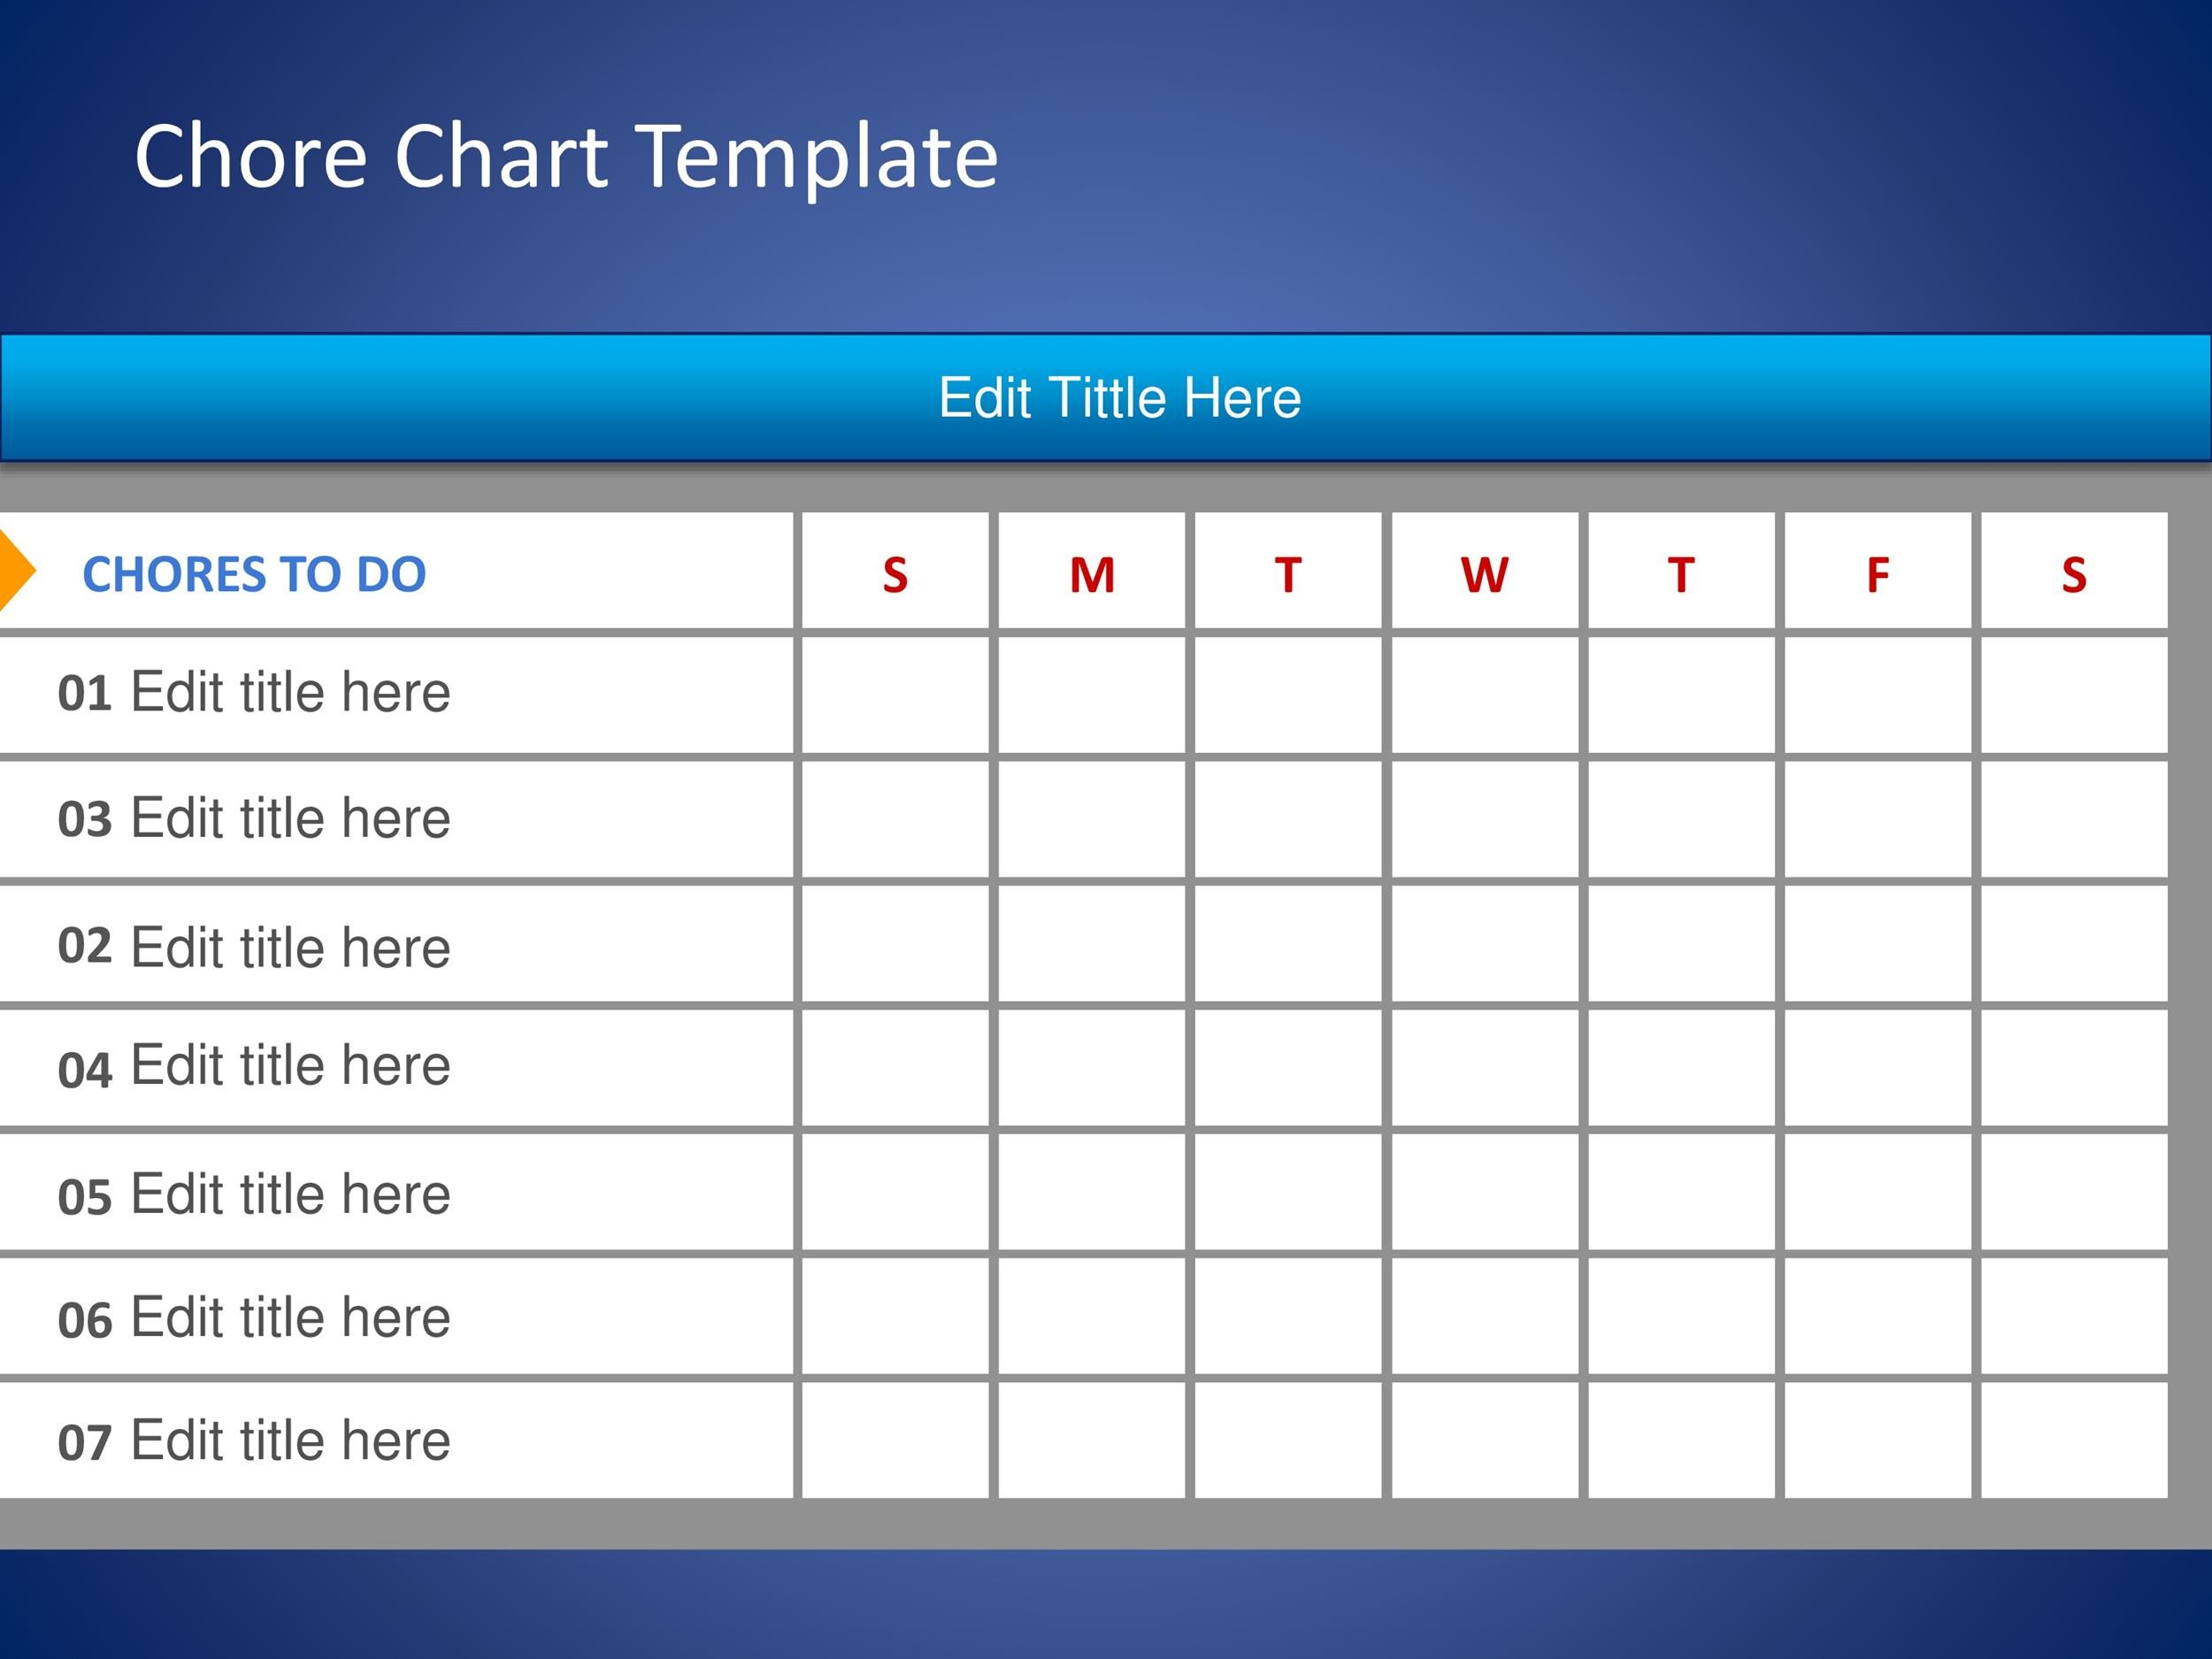 Free chore chart template 23